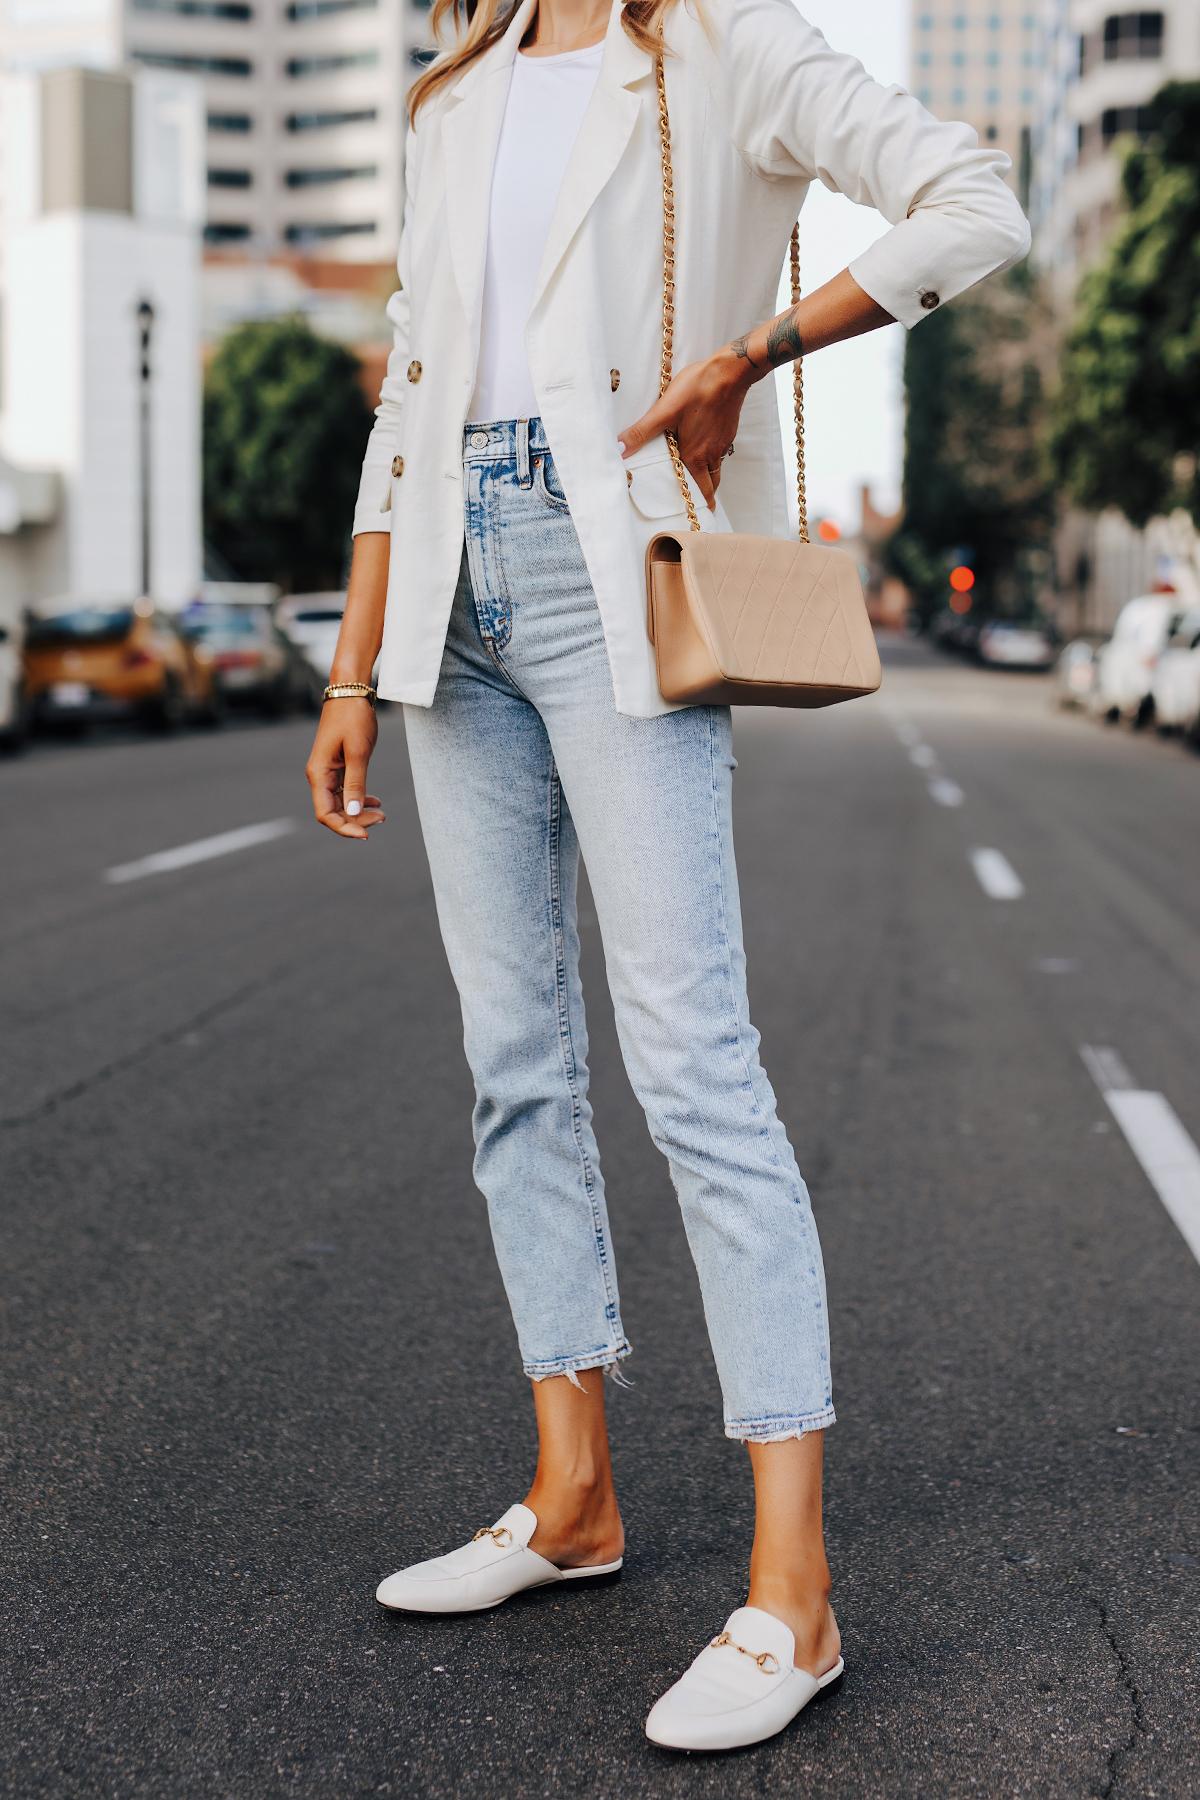 Fashion Jackson Wearing Abercrombie White Linen Blazer White Top Straigt Leg Cropped Jeans Gucci Princetown Mules White Beige Chanel Handbag